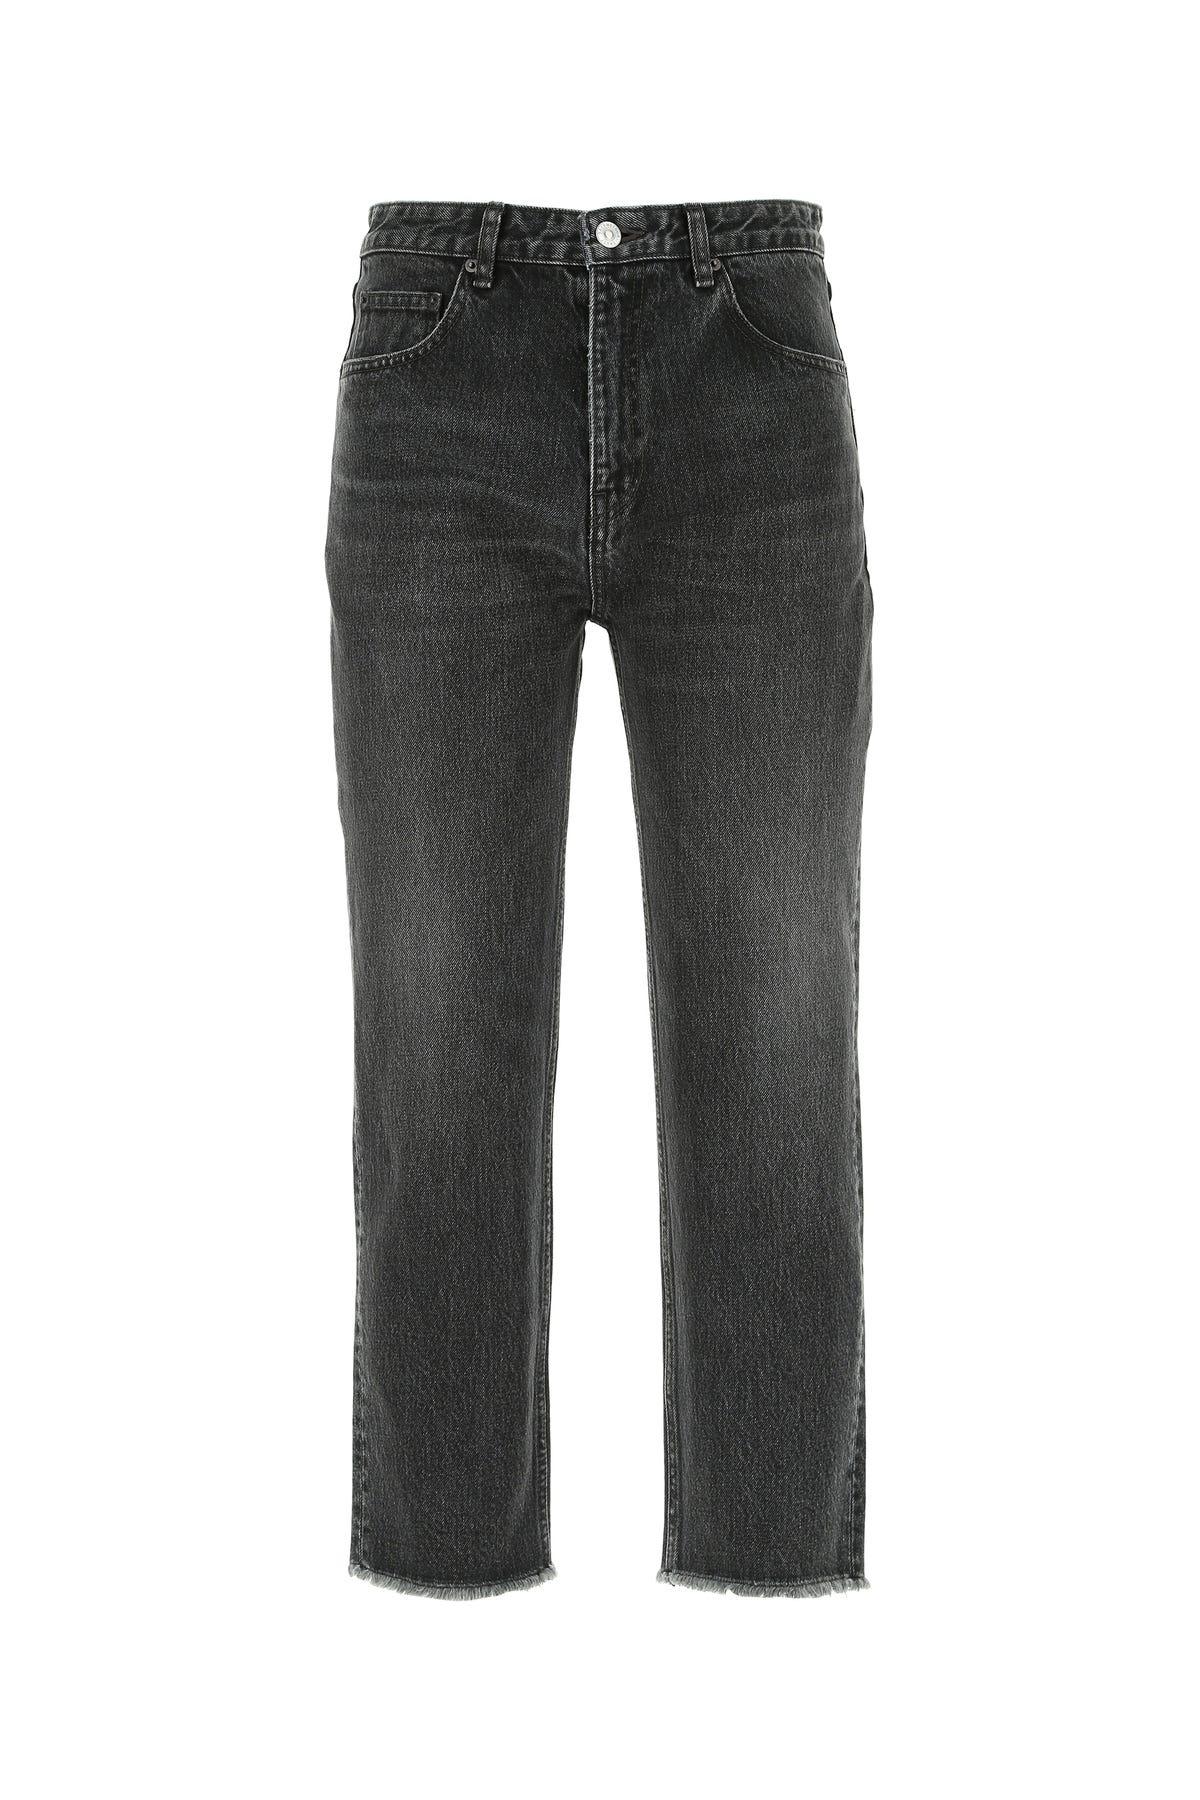 Balenciaga Dark Grey Denim Jeans  Grey  Uomo 33